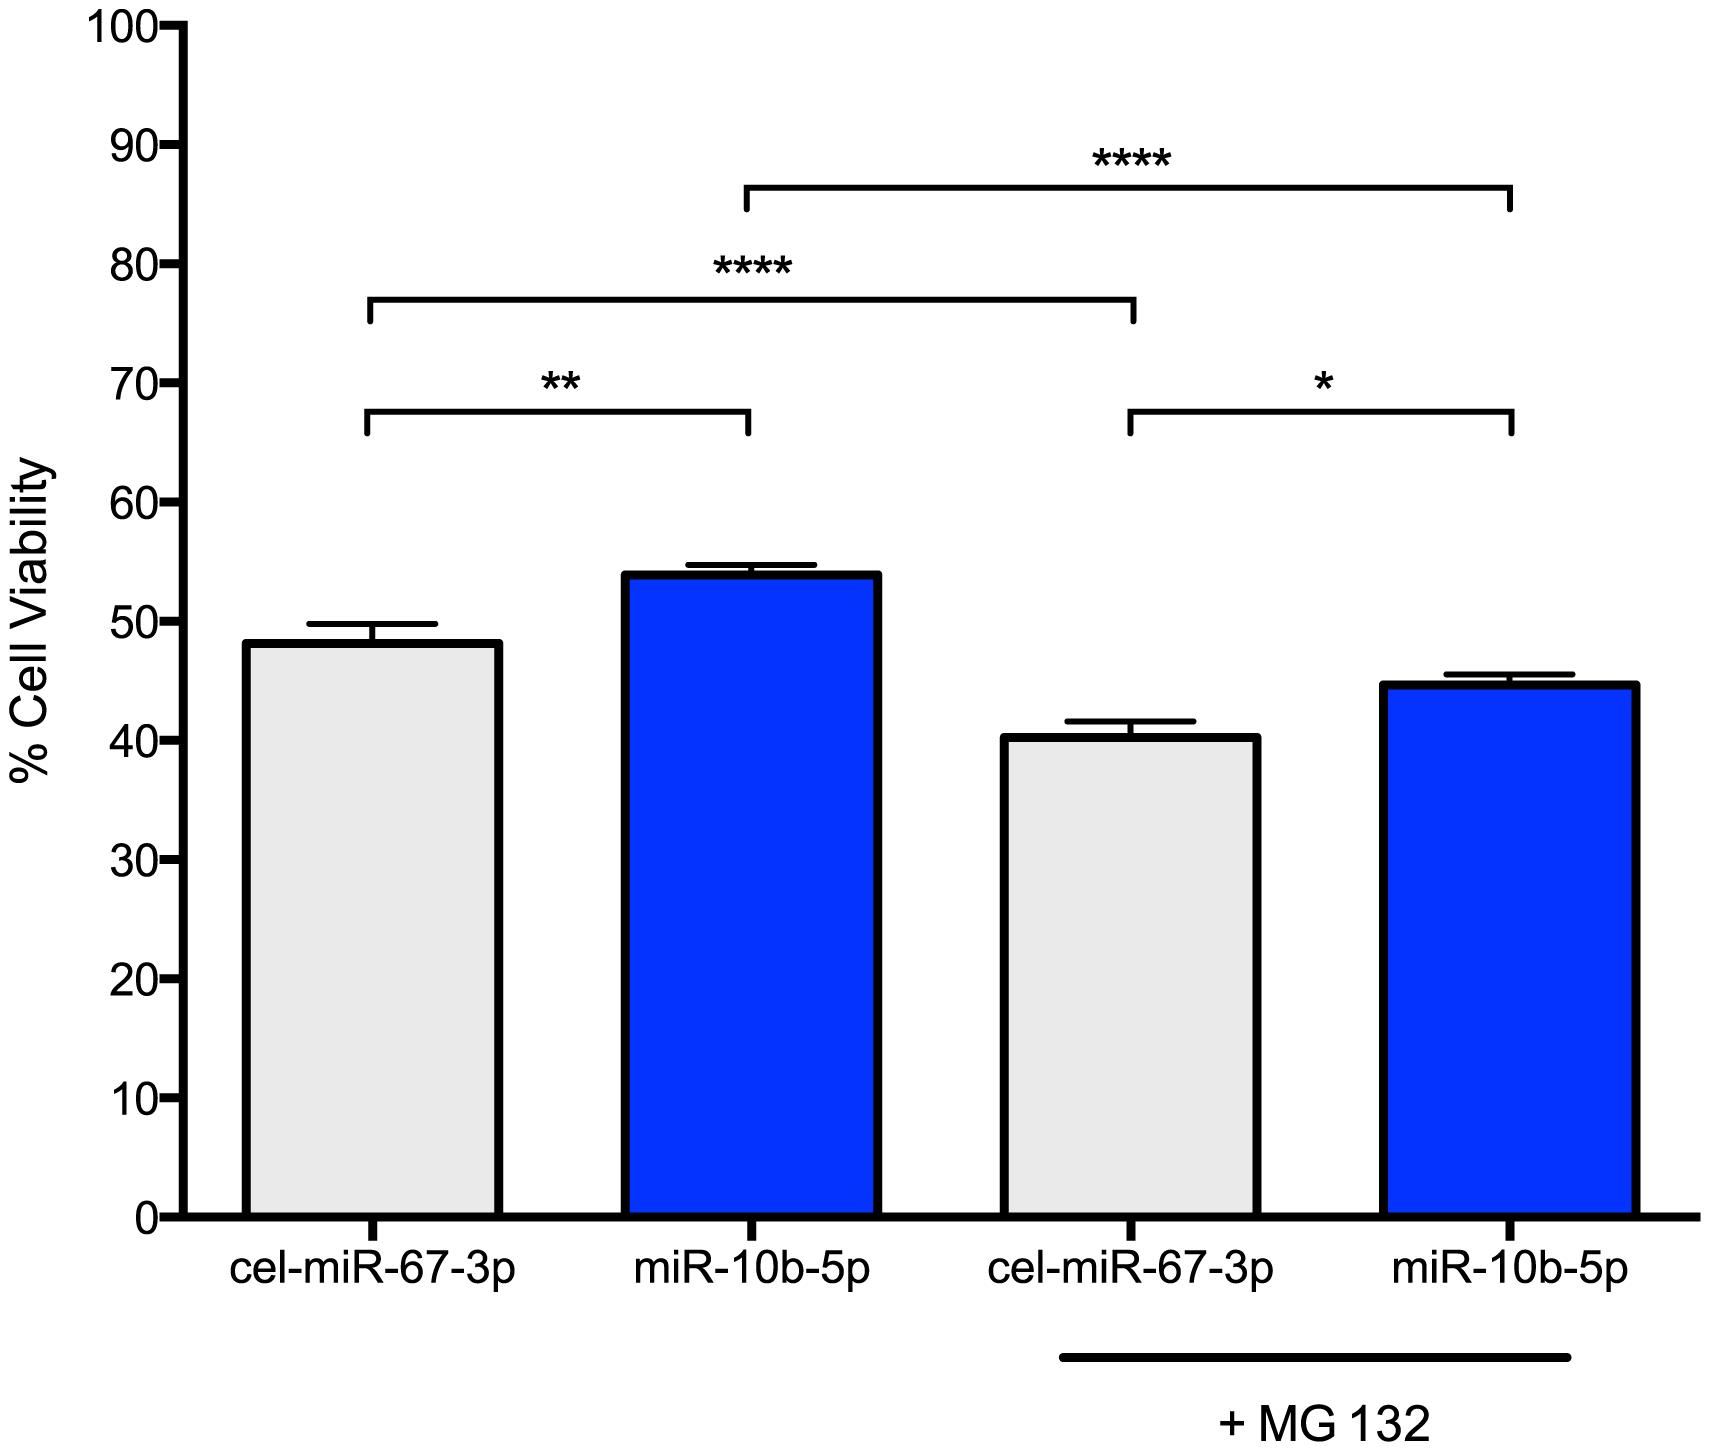 miR-10b-5p overexpressing PC12 Q73 cells exhibit reduced cytotoxicity.